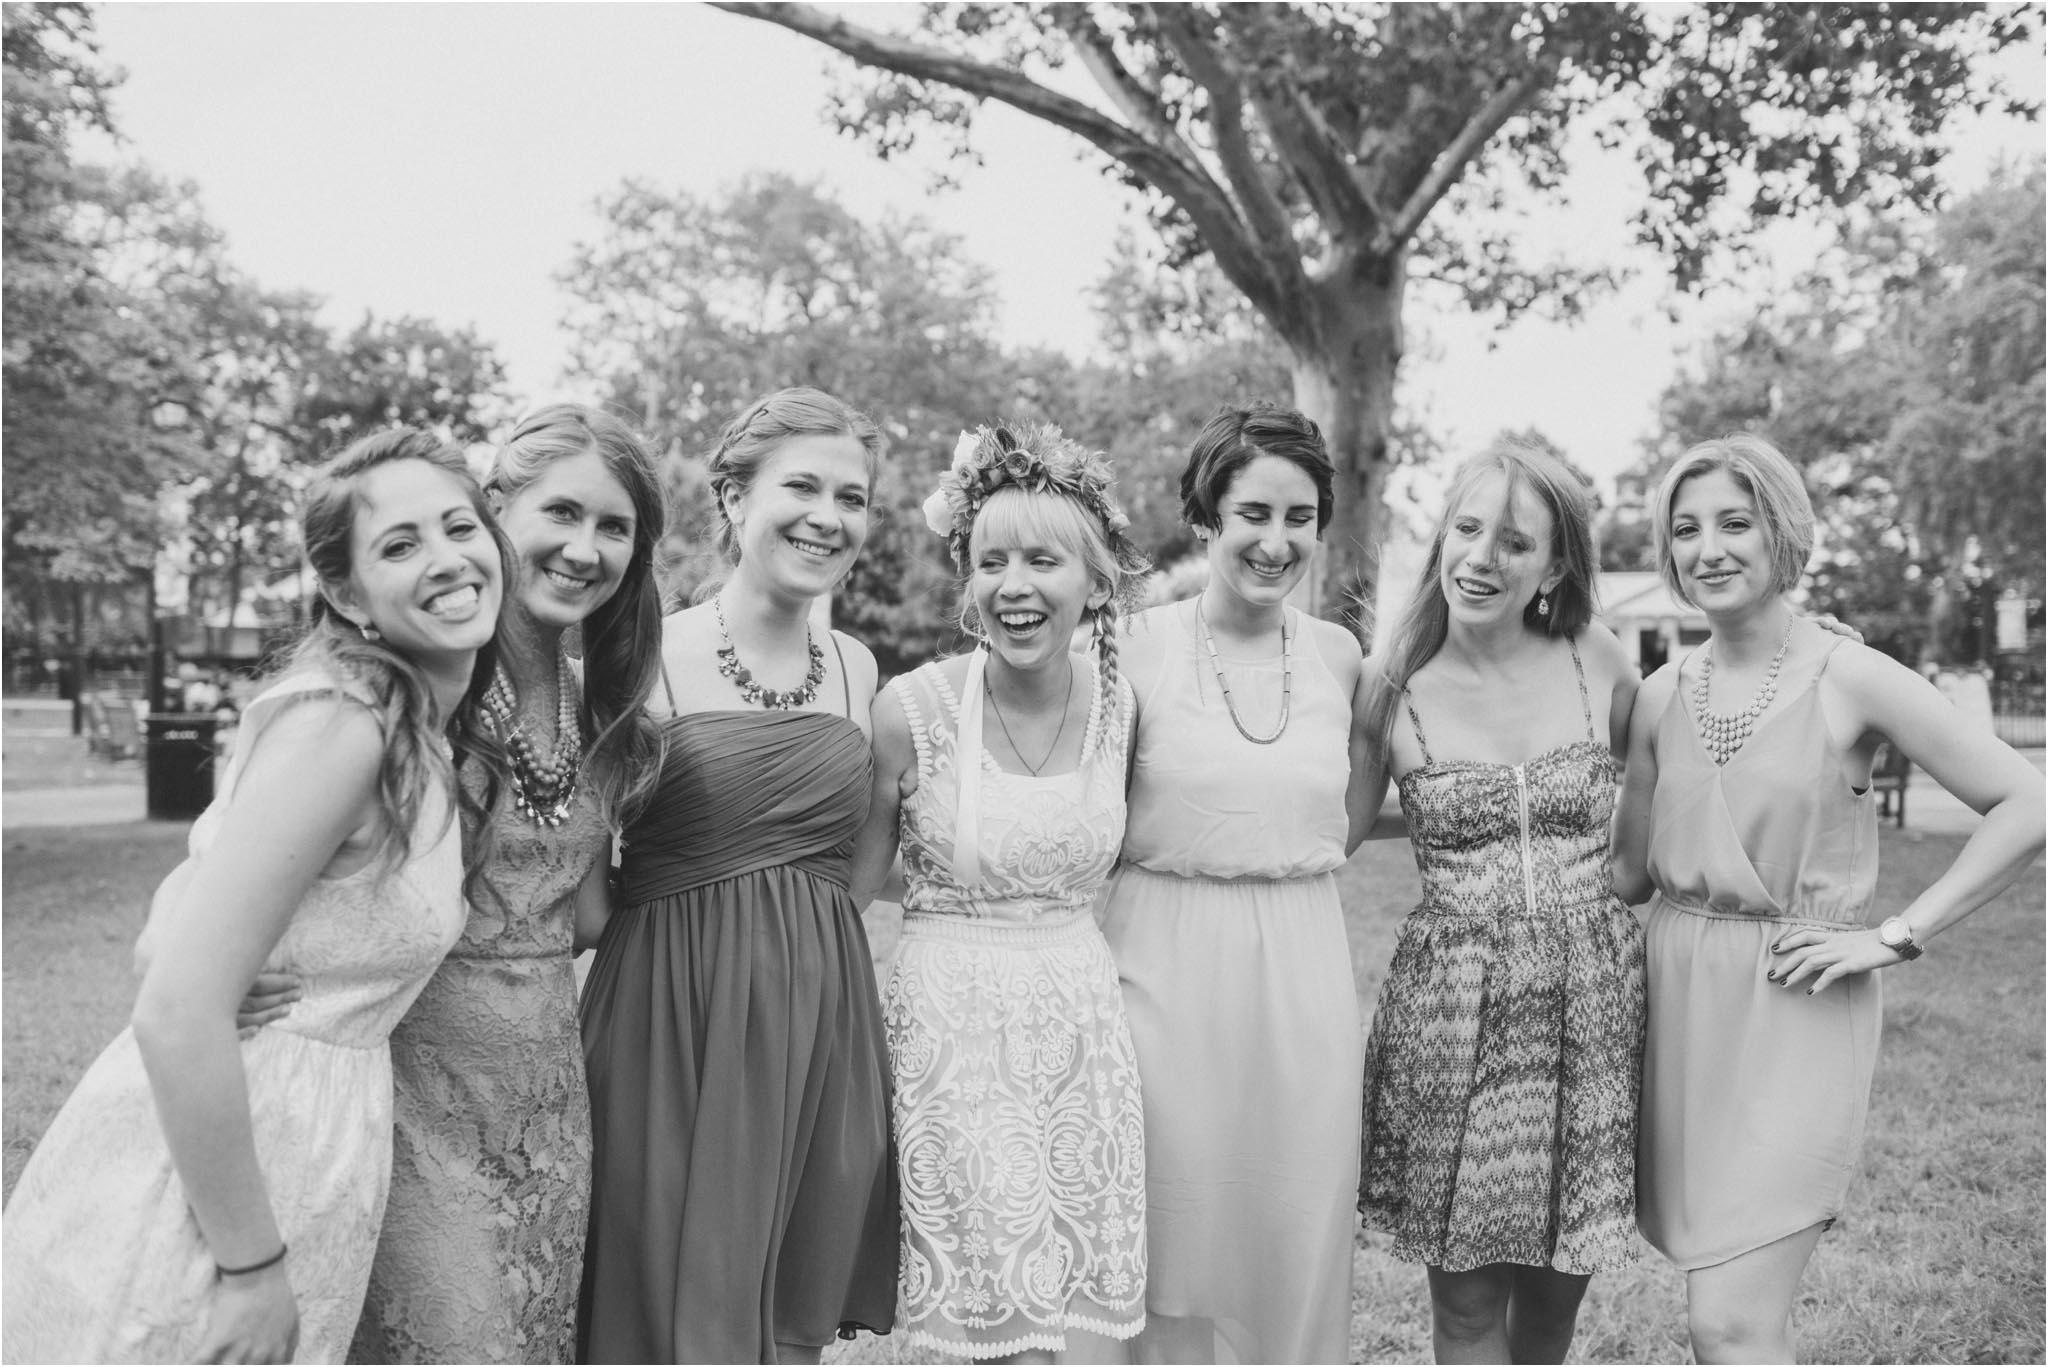 Franklin Square, wedding